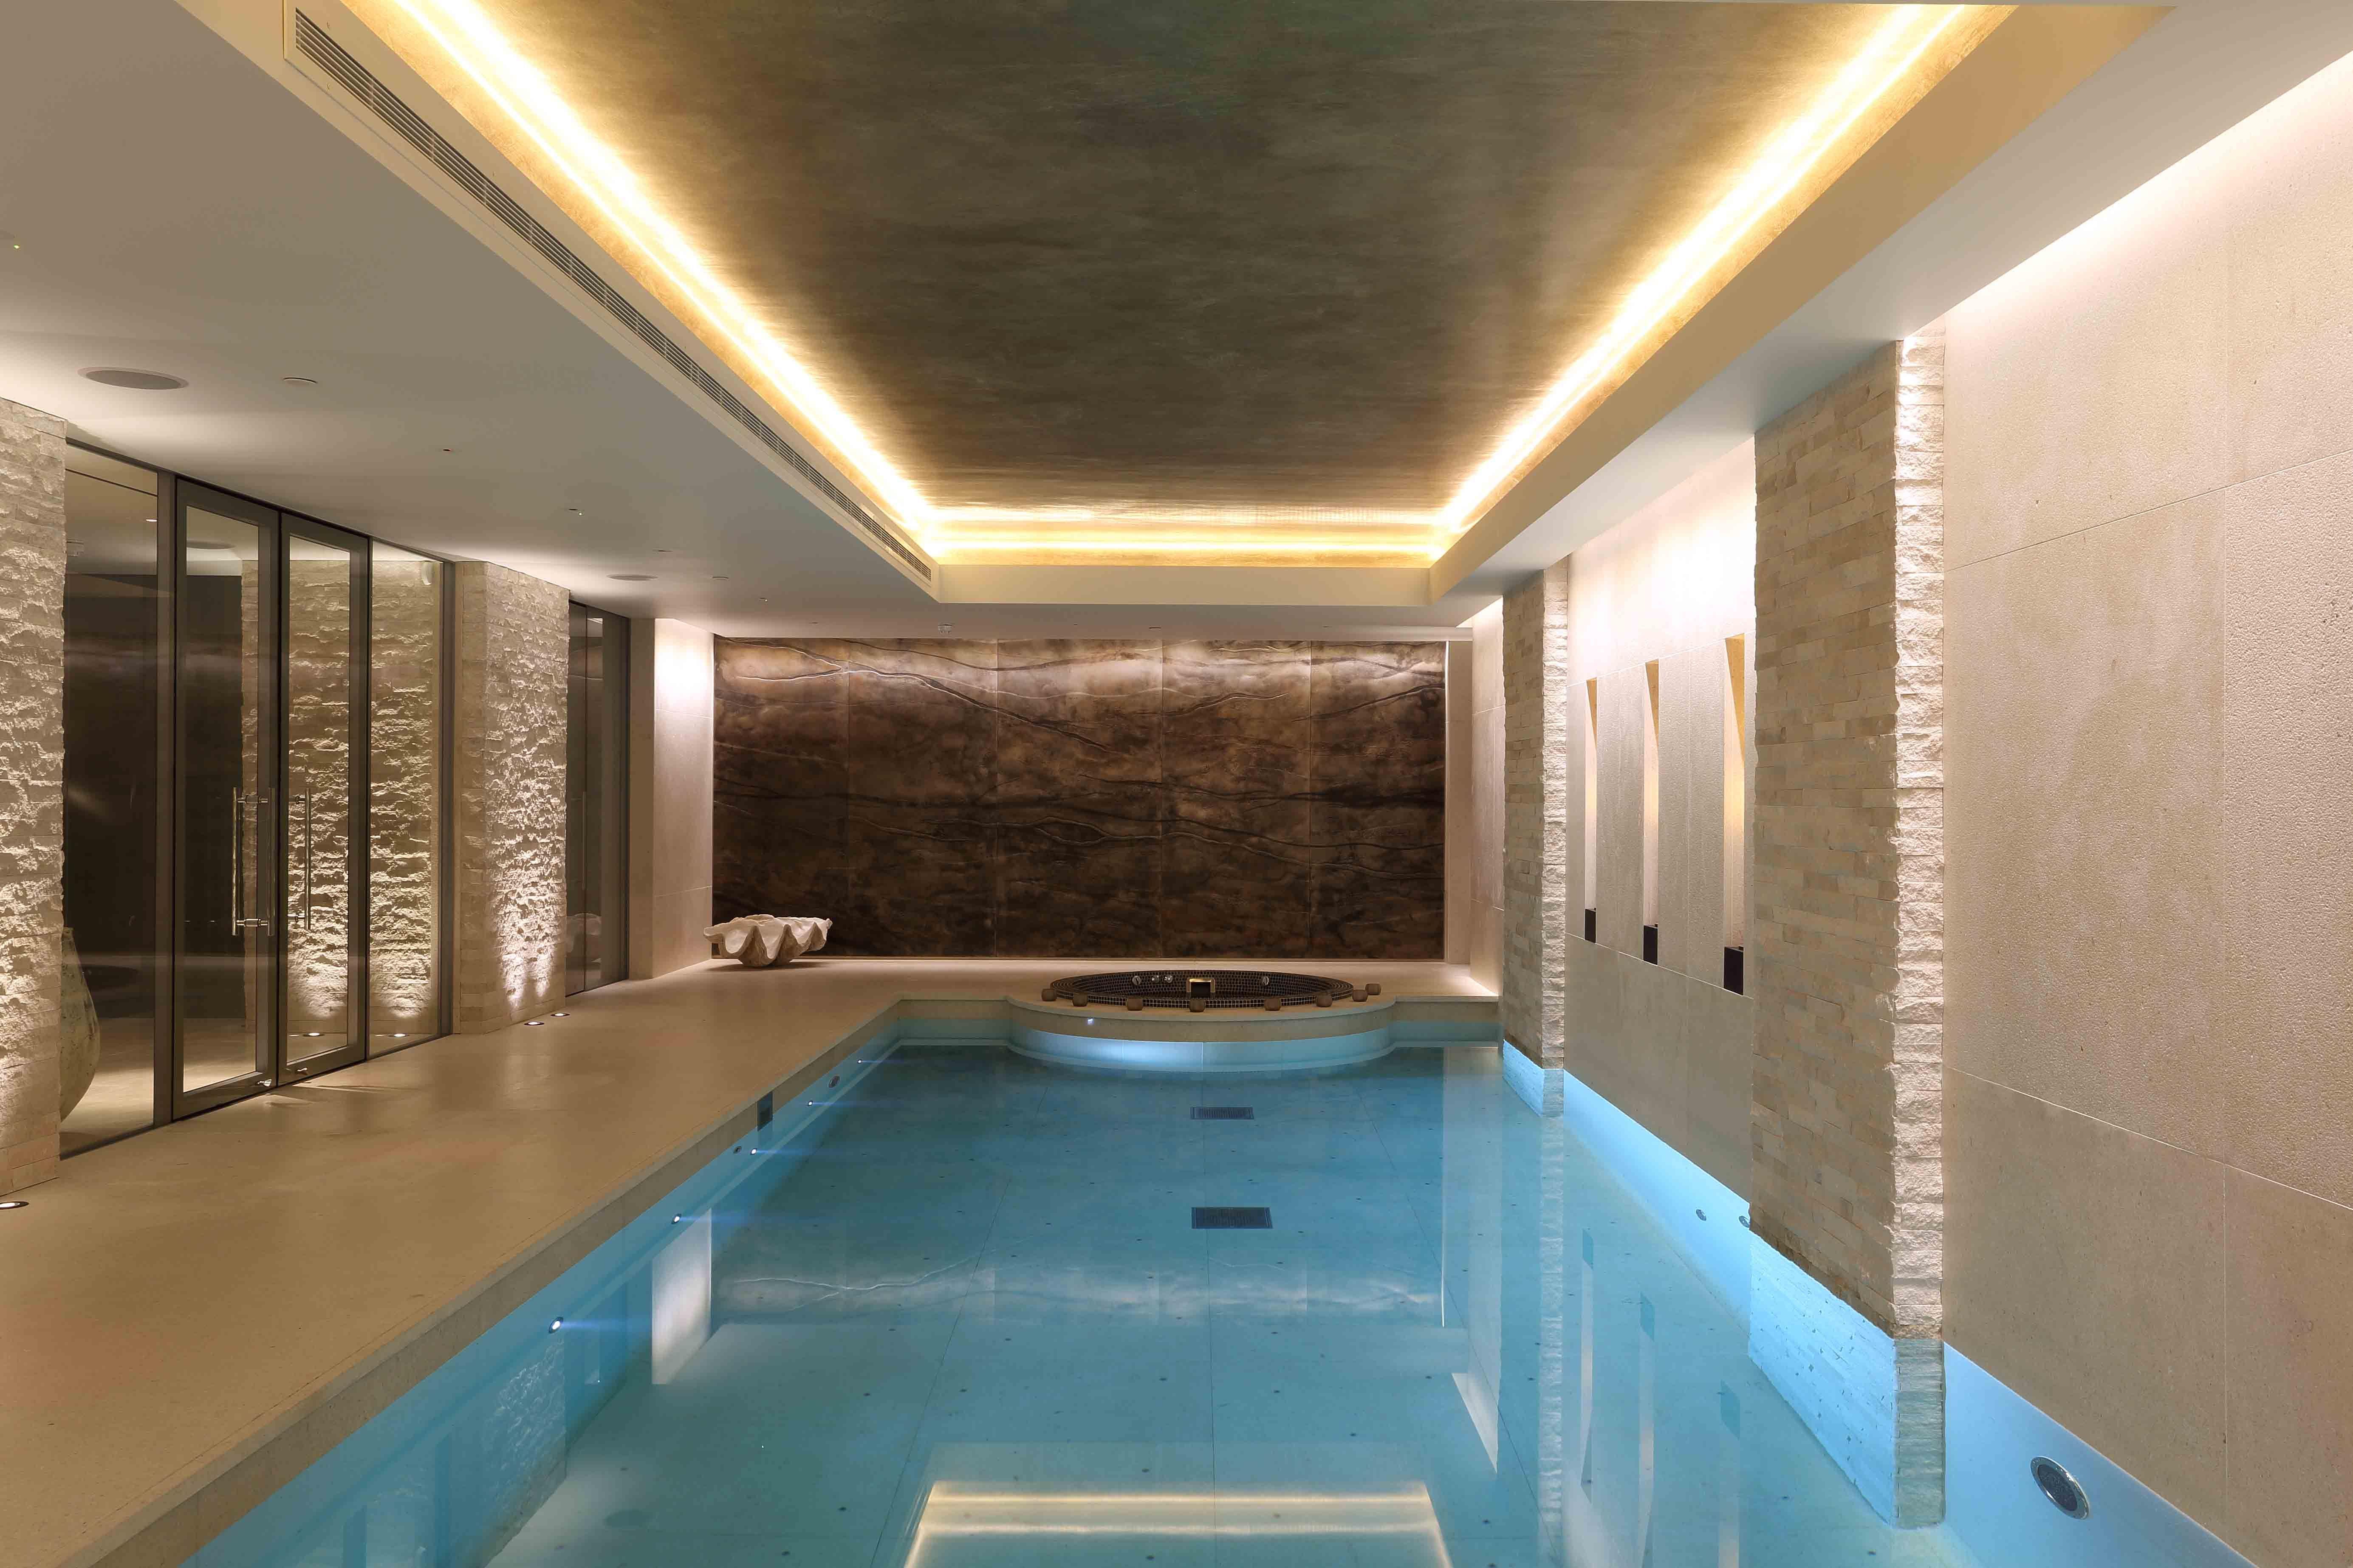 Basement Swimming Pool Design Lower Ground Floor Swimming Pool  Knightsbridge Bolig  Pinterest